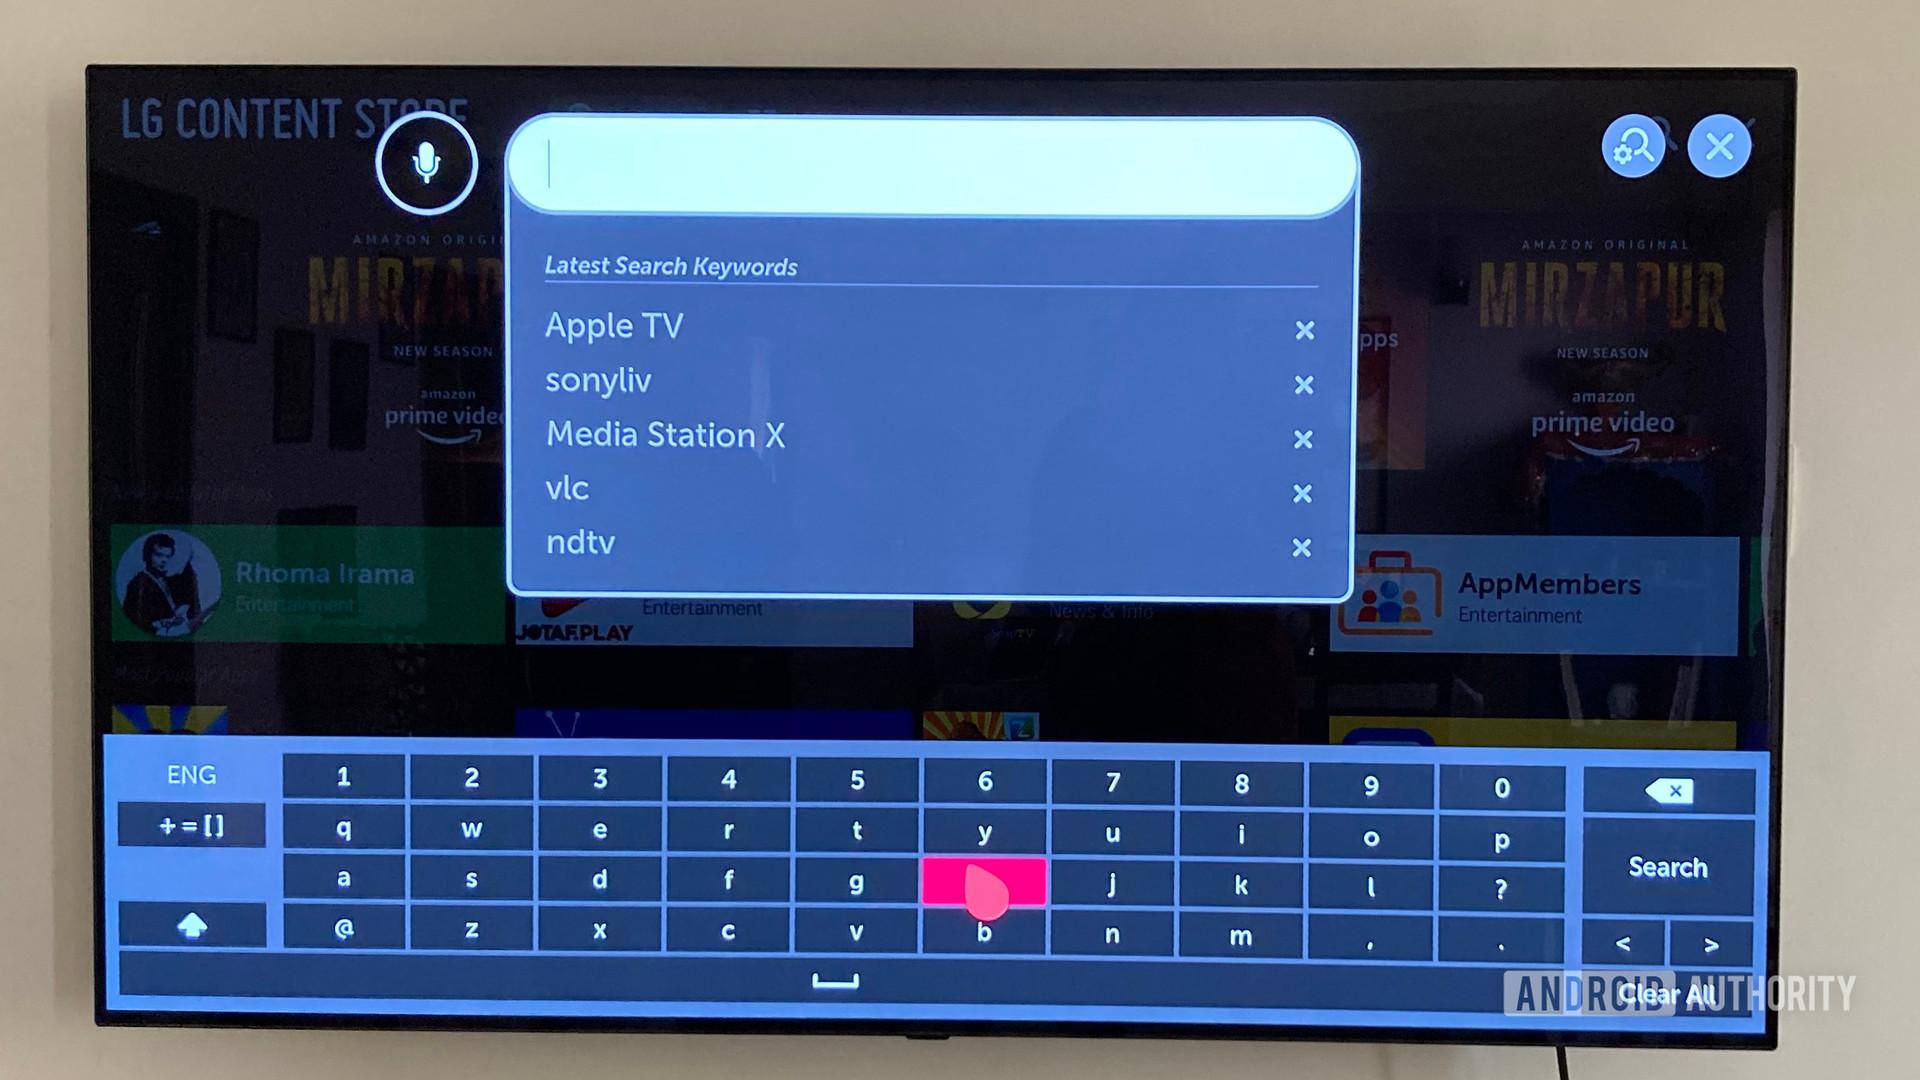 LG TV Web OS Navigation